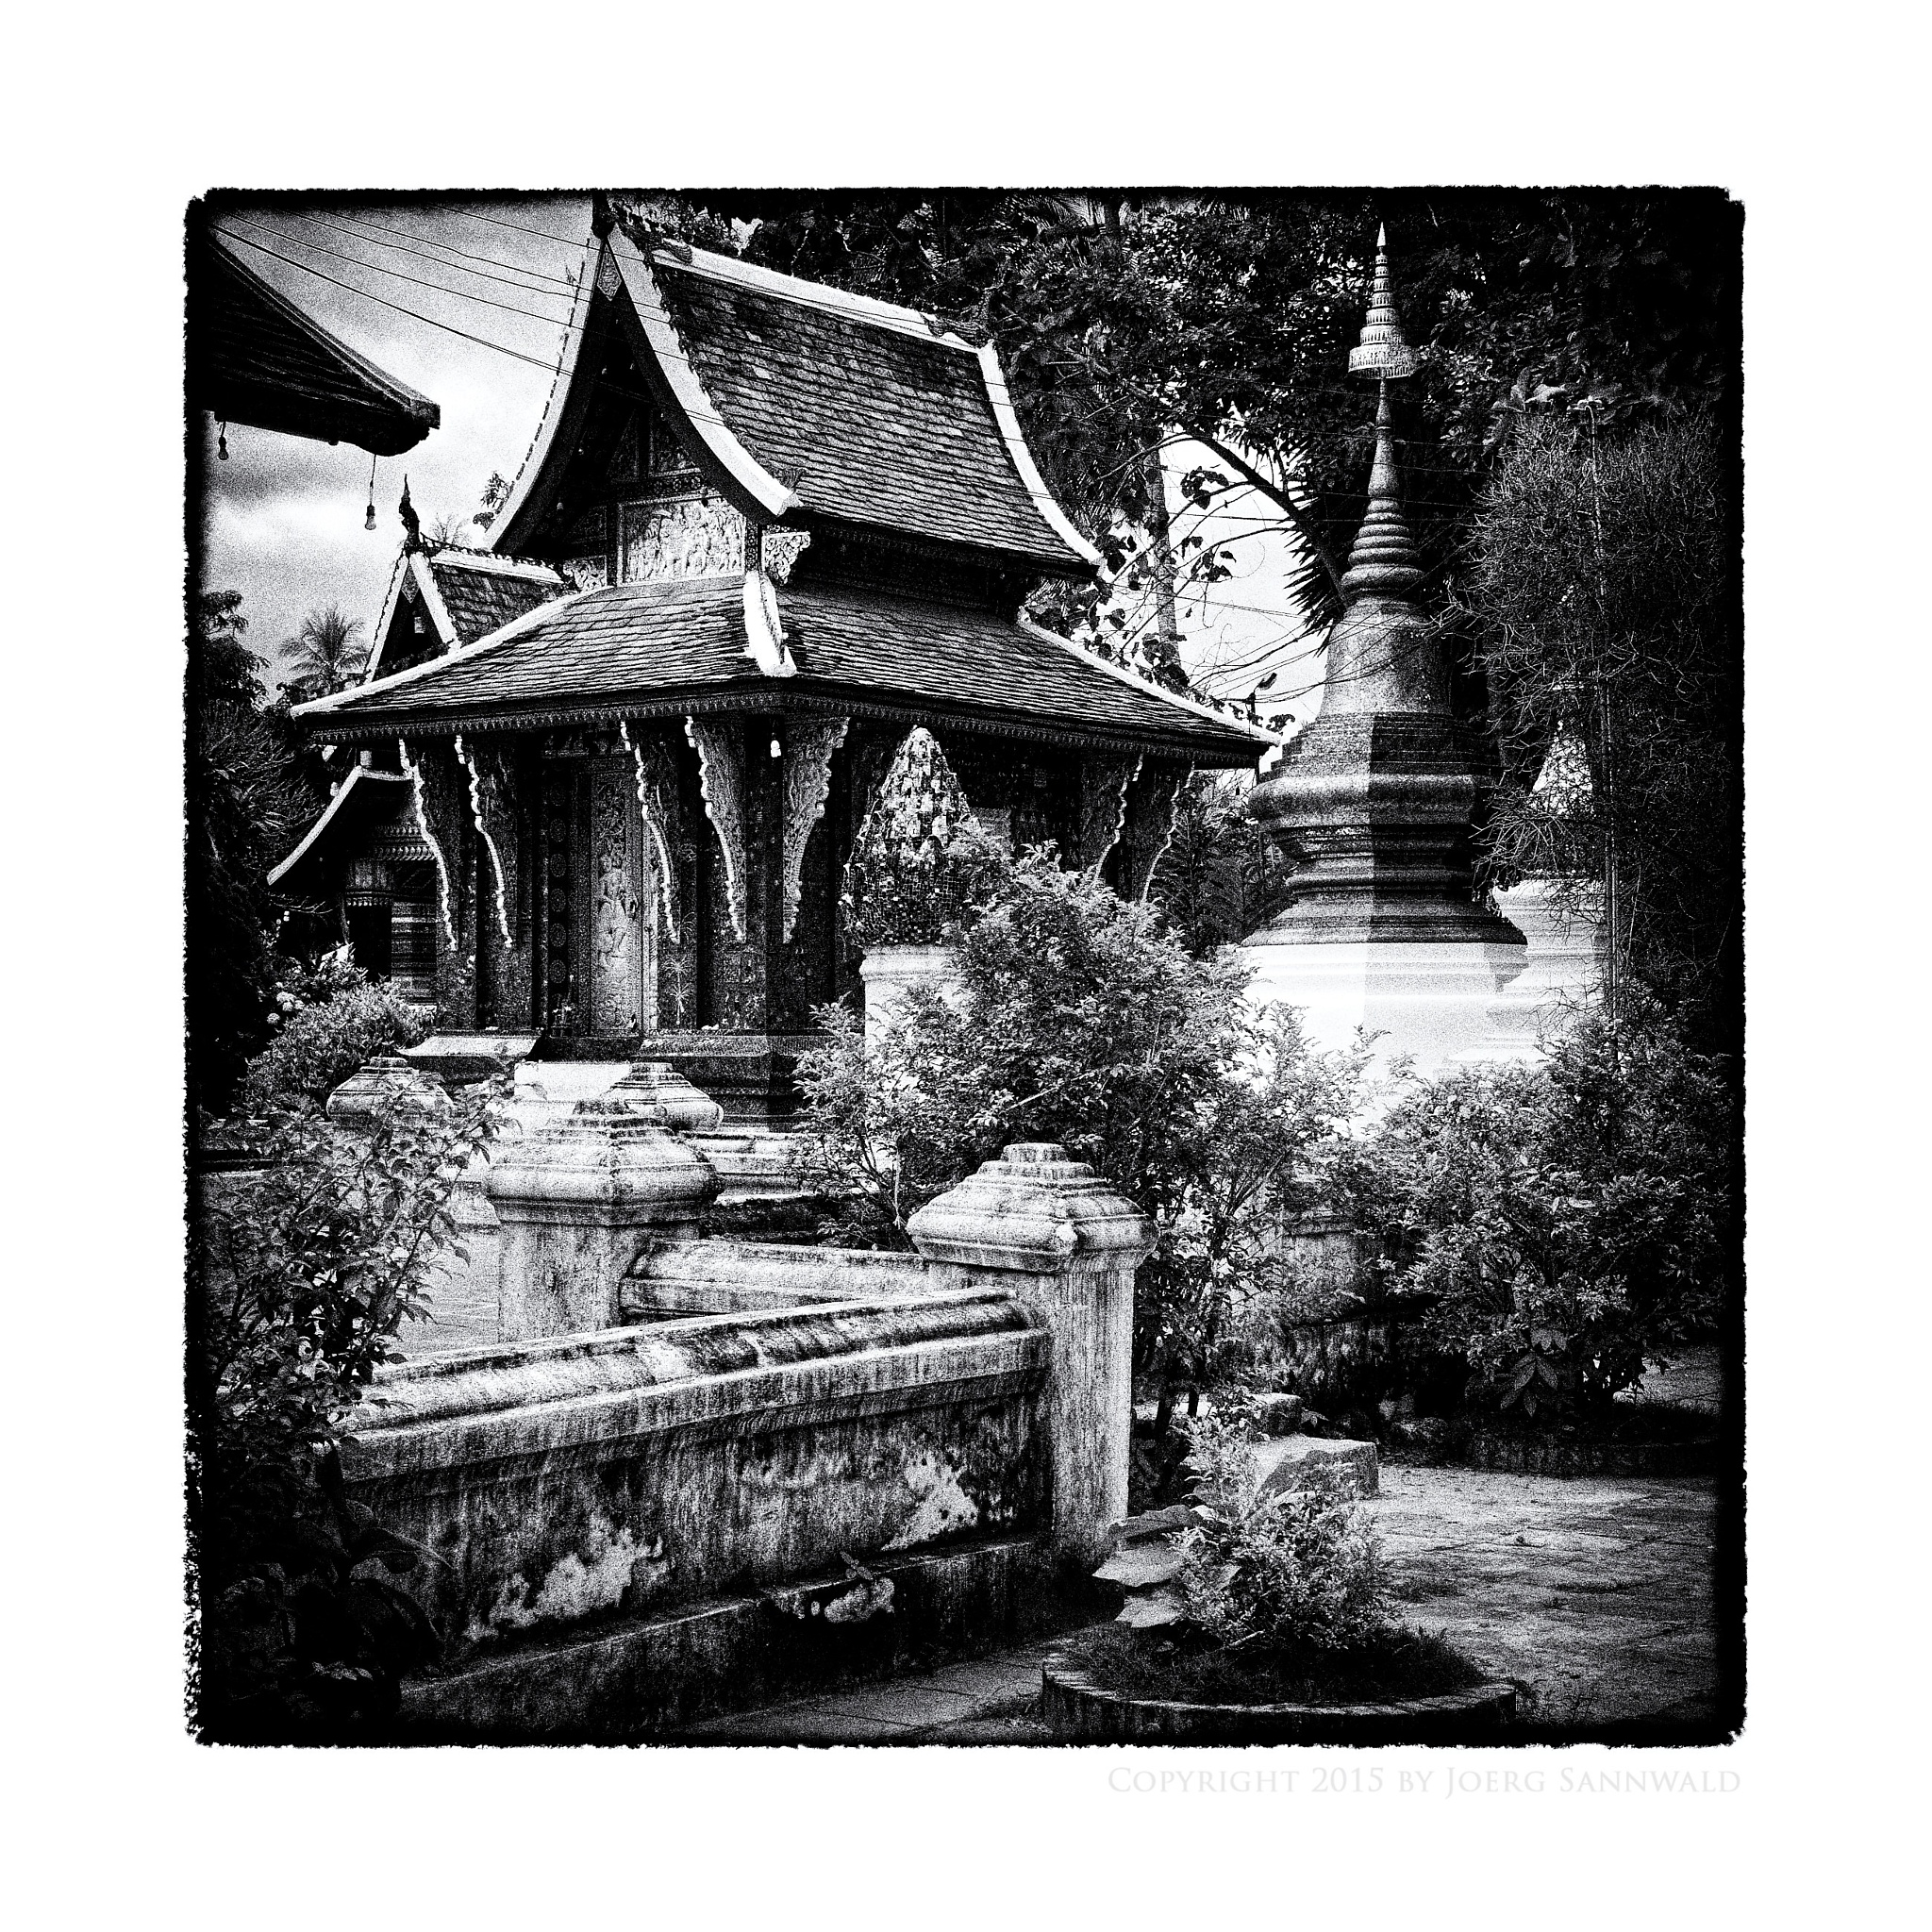 wat xiang thong [B1208-112_2_wf20] by Joerg Sannwald